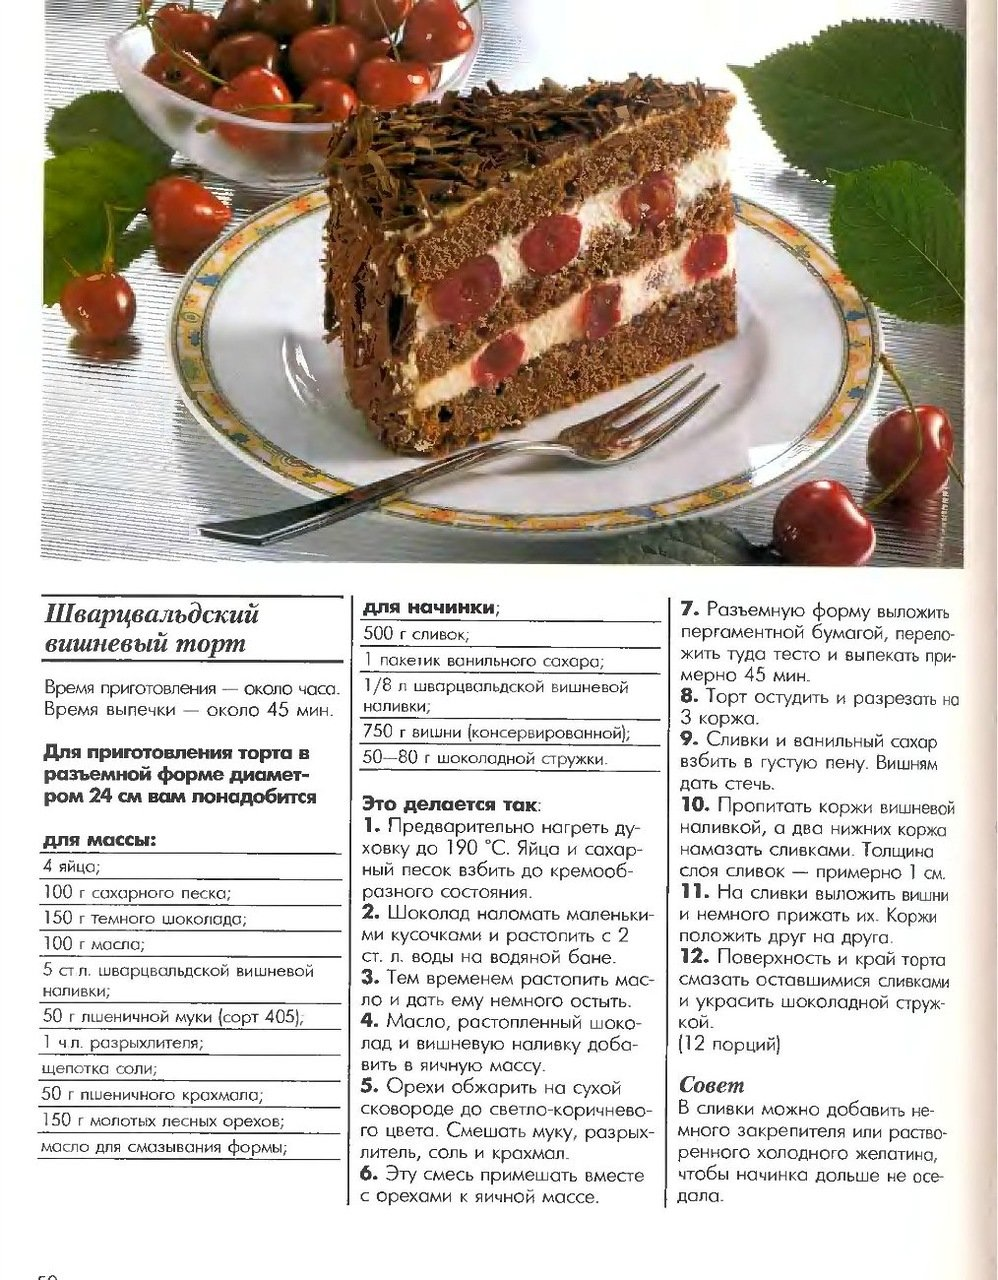 Торт на картинках и рецепт